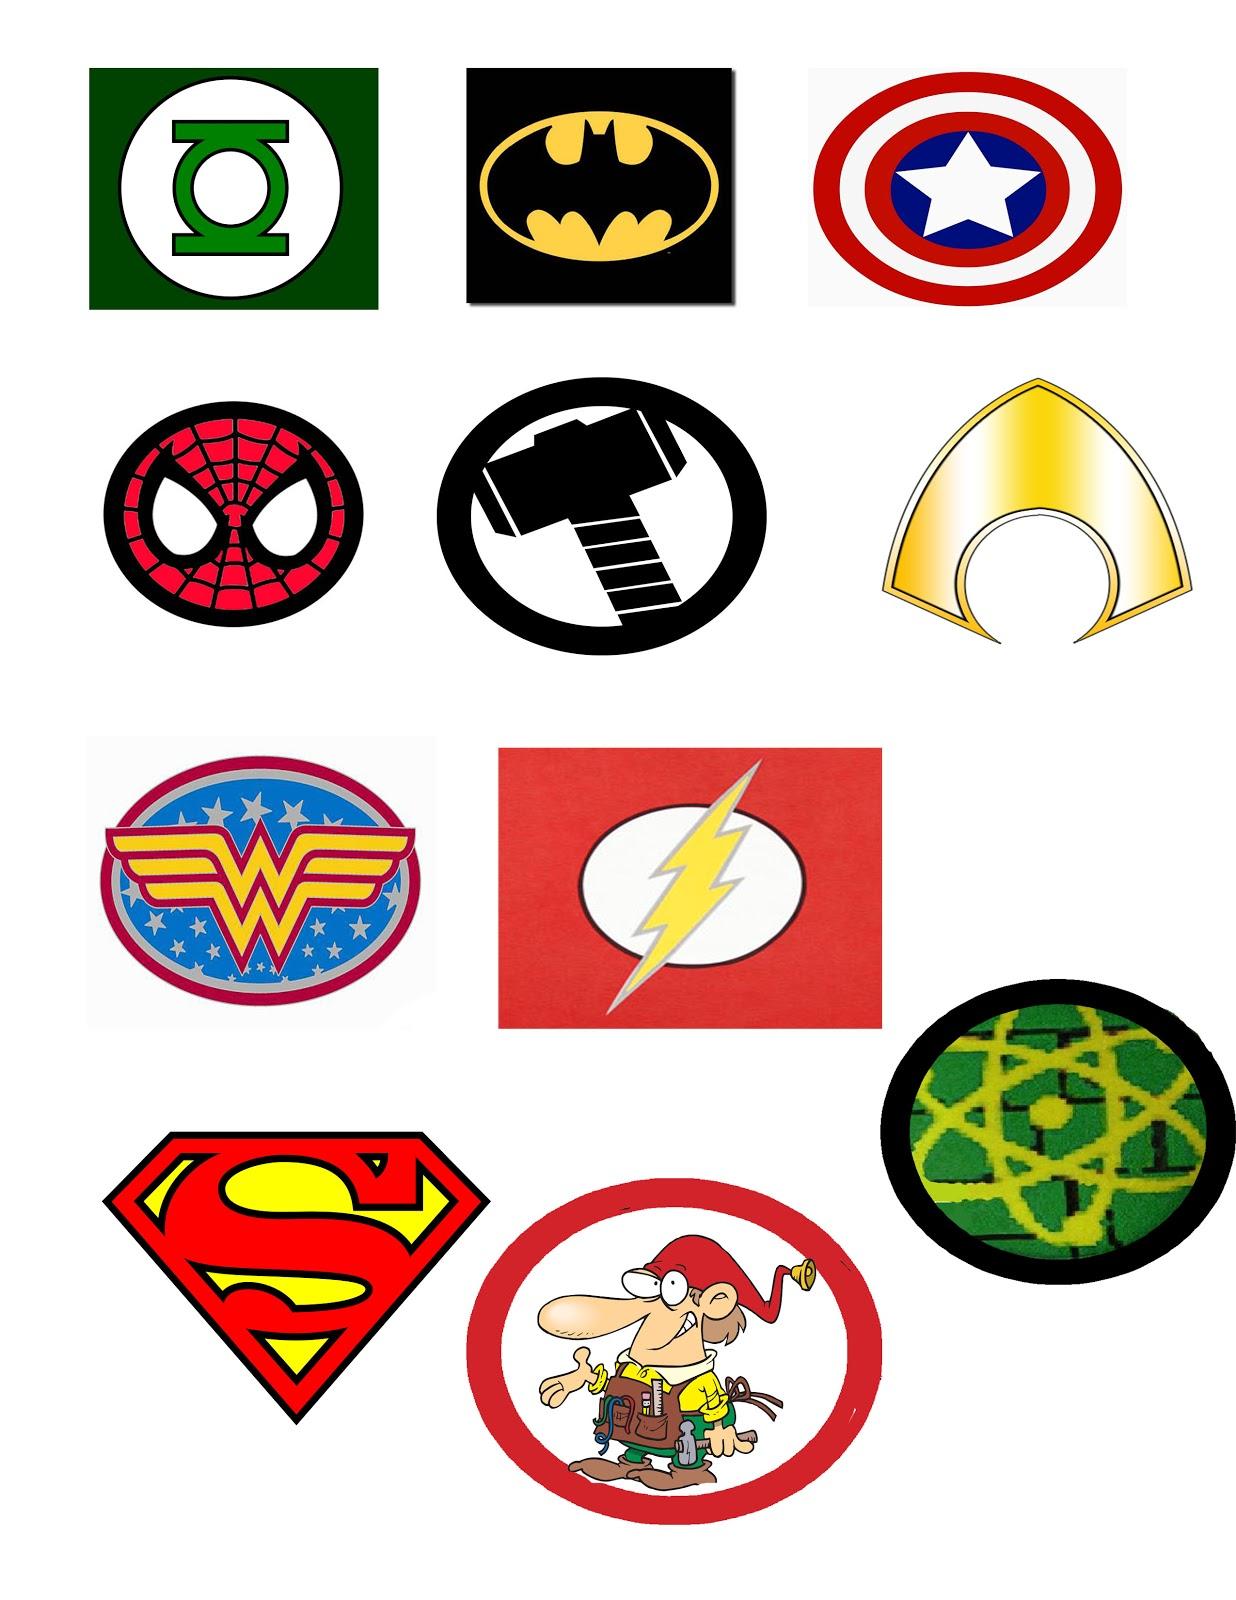 Superman Invitations Templates Free were Perfect Sample To Make Fresh Invitations Sample